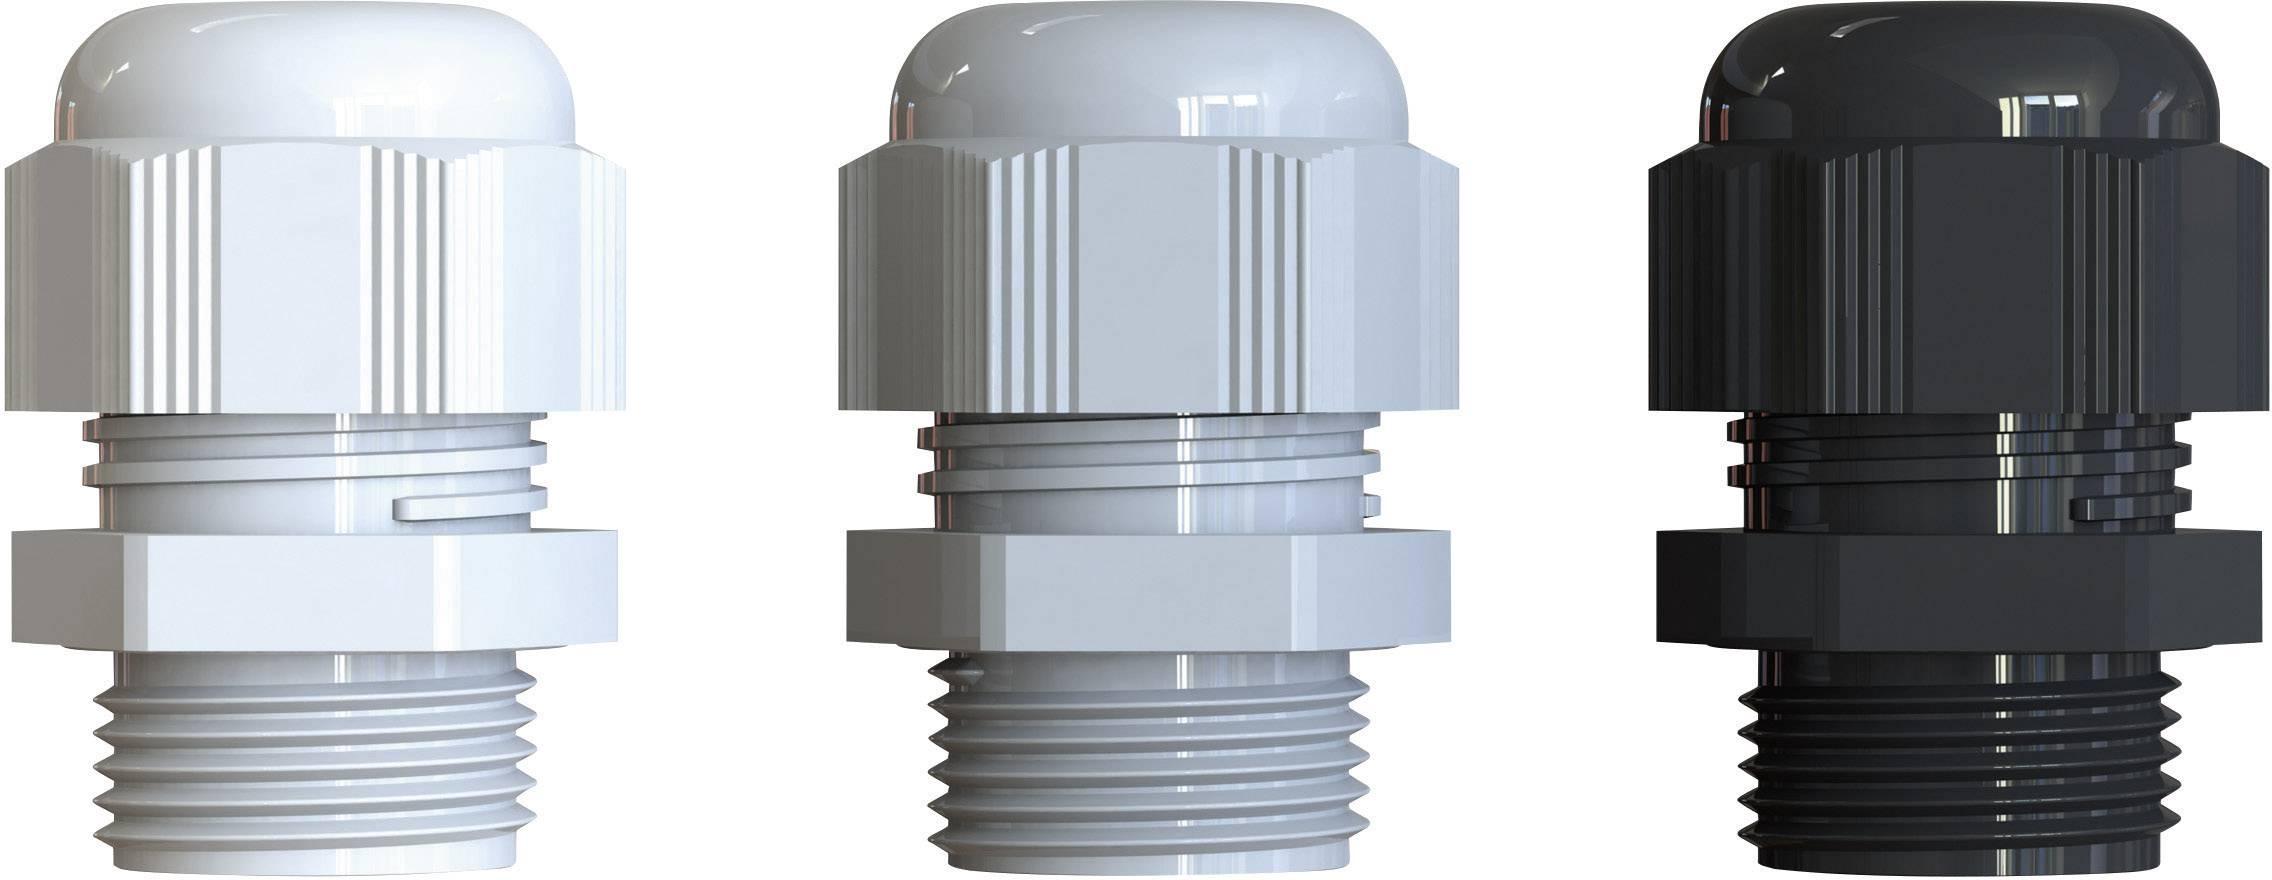 Kabelová průchodka Bimed BM-EN-01 BM-EN-01 polyamid, délka závitu 10 mm, stříbrnošedá (RAL 7001), 50 ks